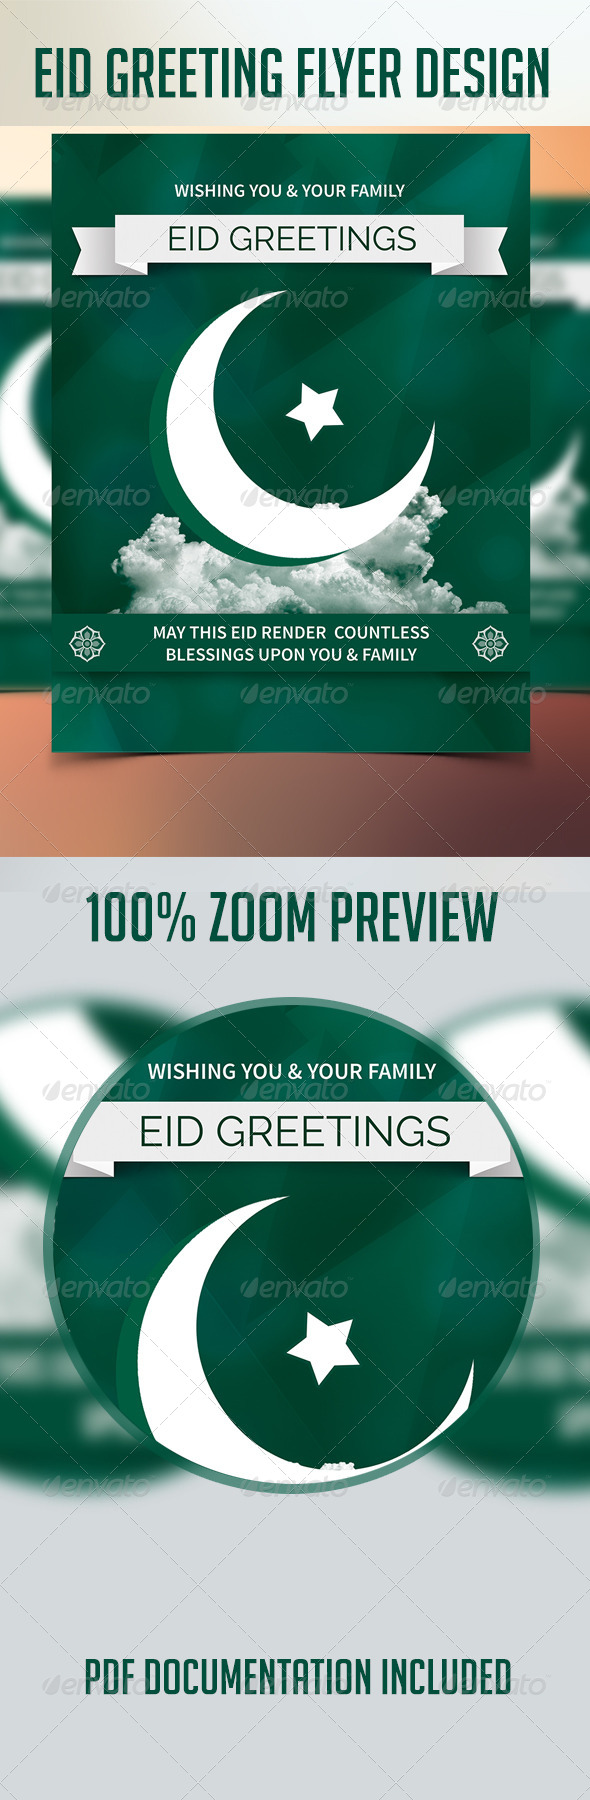 GraphicRiver Eid Greeting Flyer Design 8392385